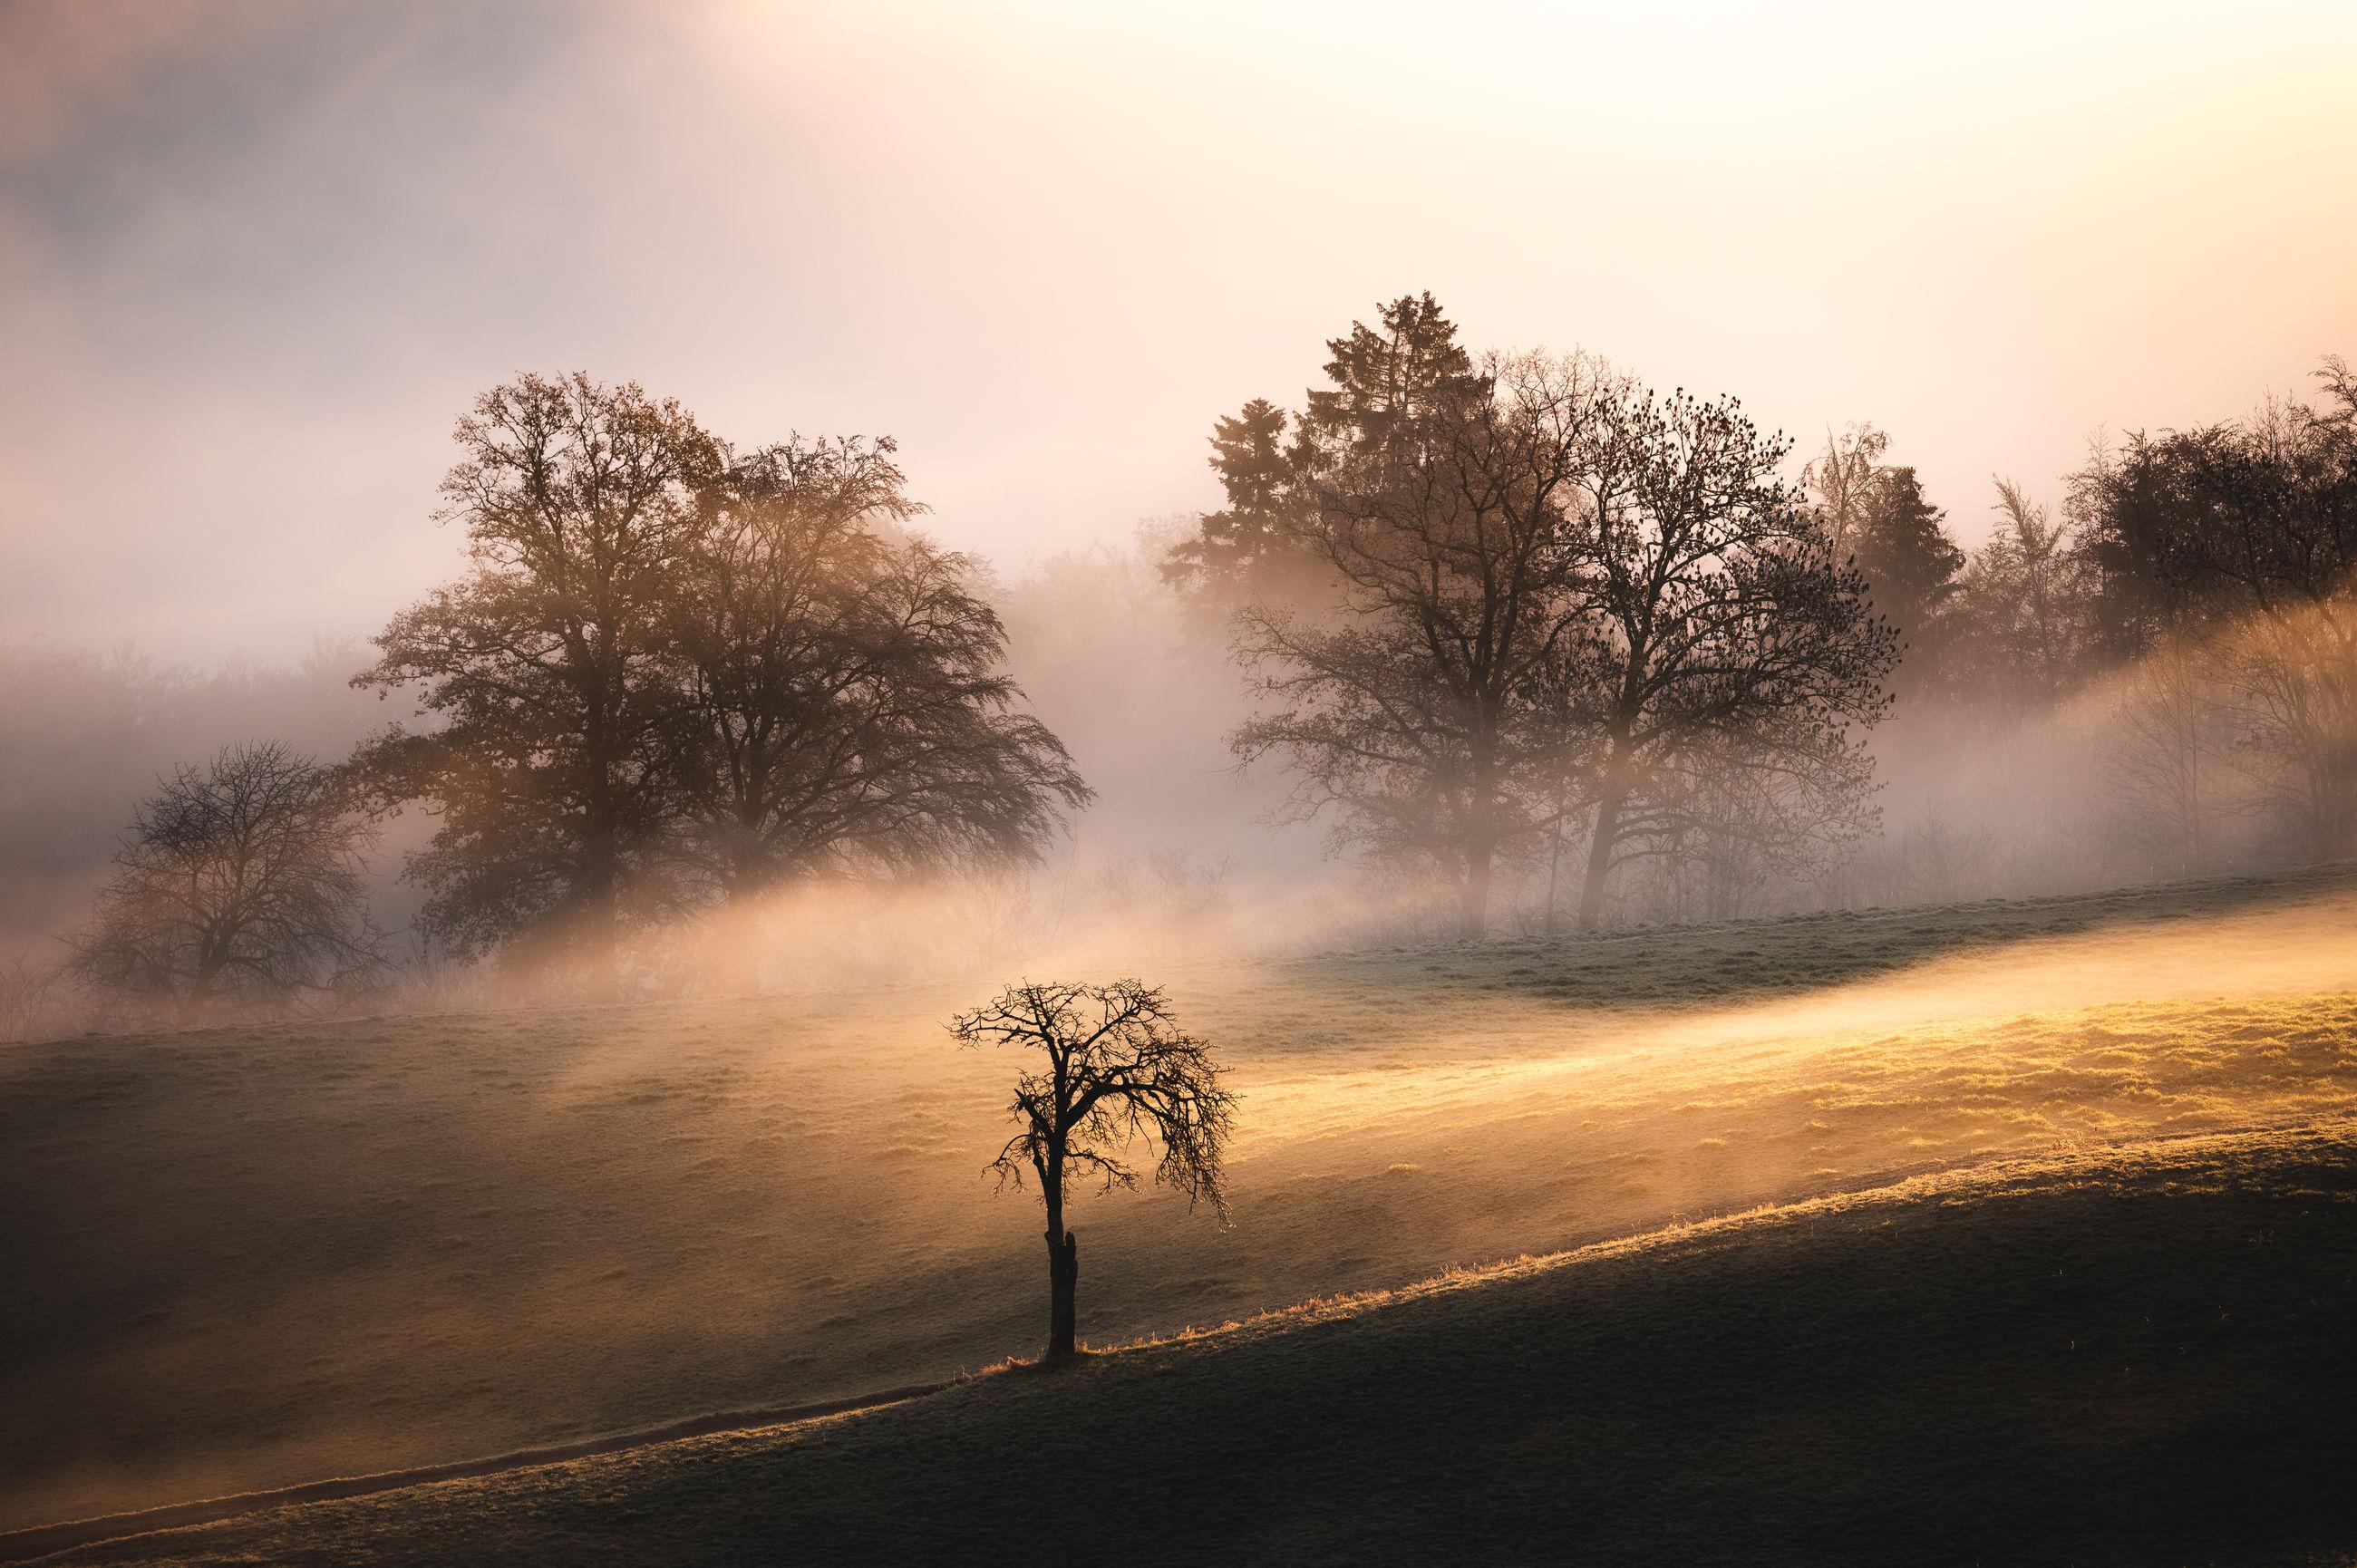 morning, tree, mist, dawn, nature, sunrise, fog, plant, environment, sunlight, sky, landscape, land, beauty in nature, sun, rural scene, scenics - nature, cloud, tranquility, twilight, outdoors, no people, forest, silhouette, road, tranquil scene, non-urban scene, back lit, travel, horizon, sunbeam